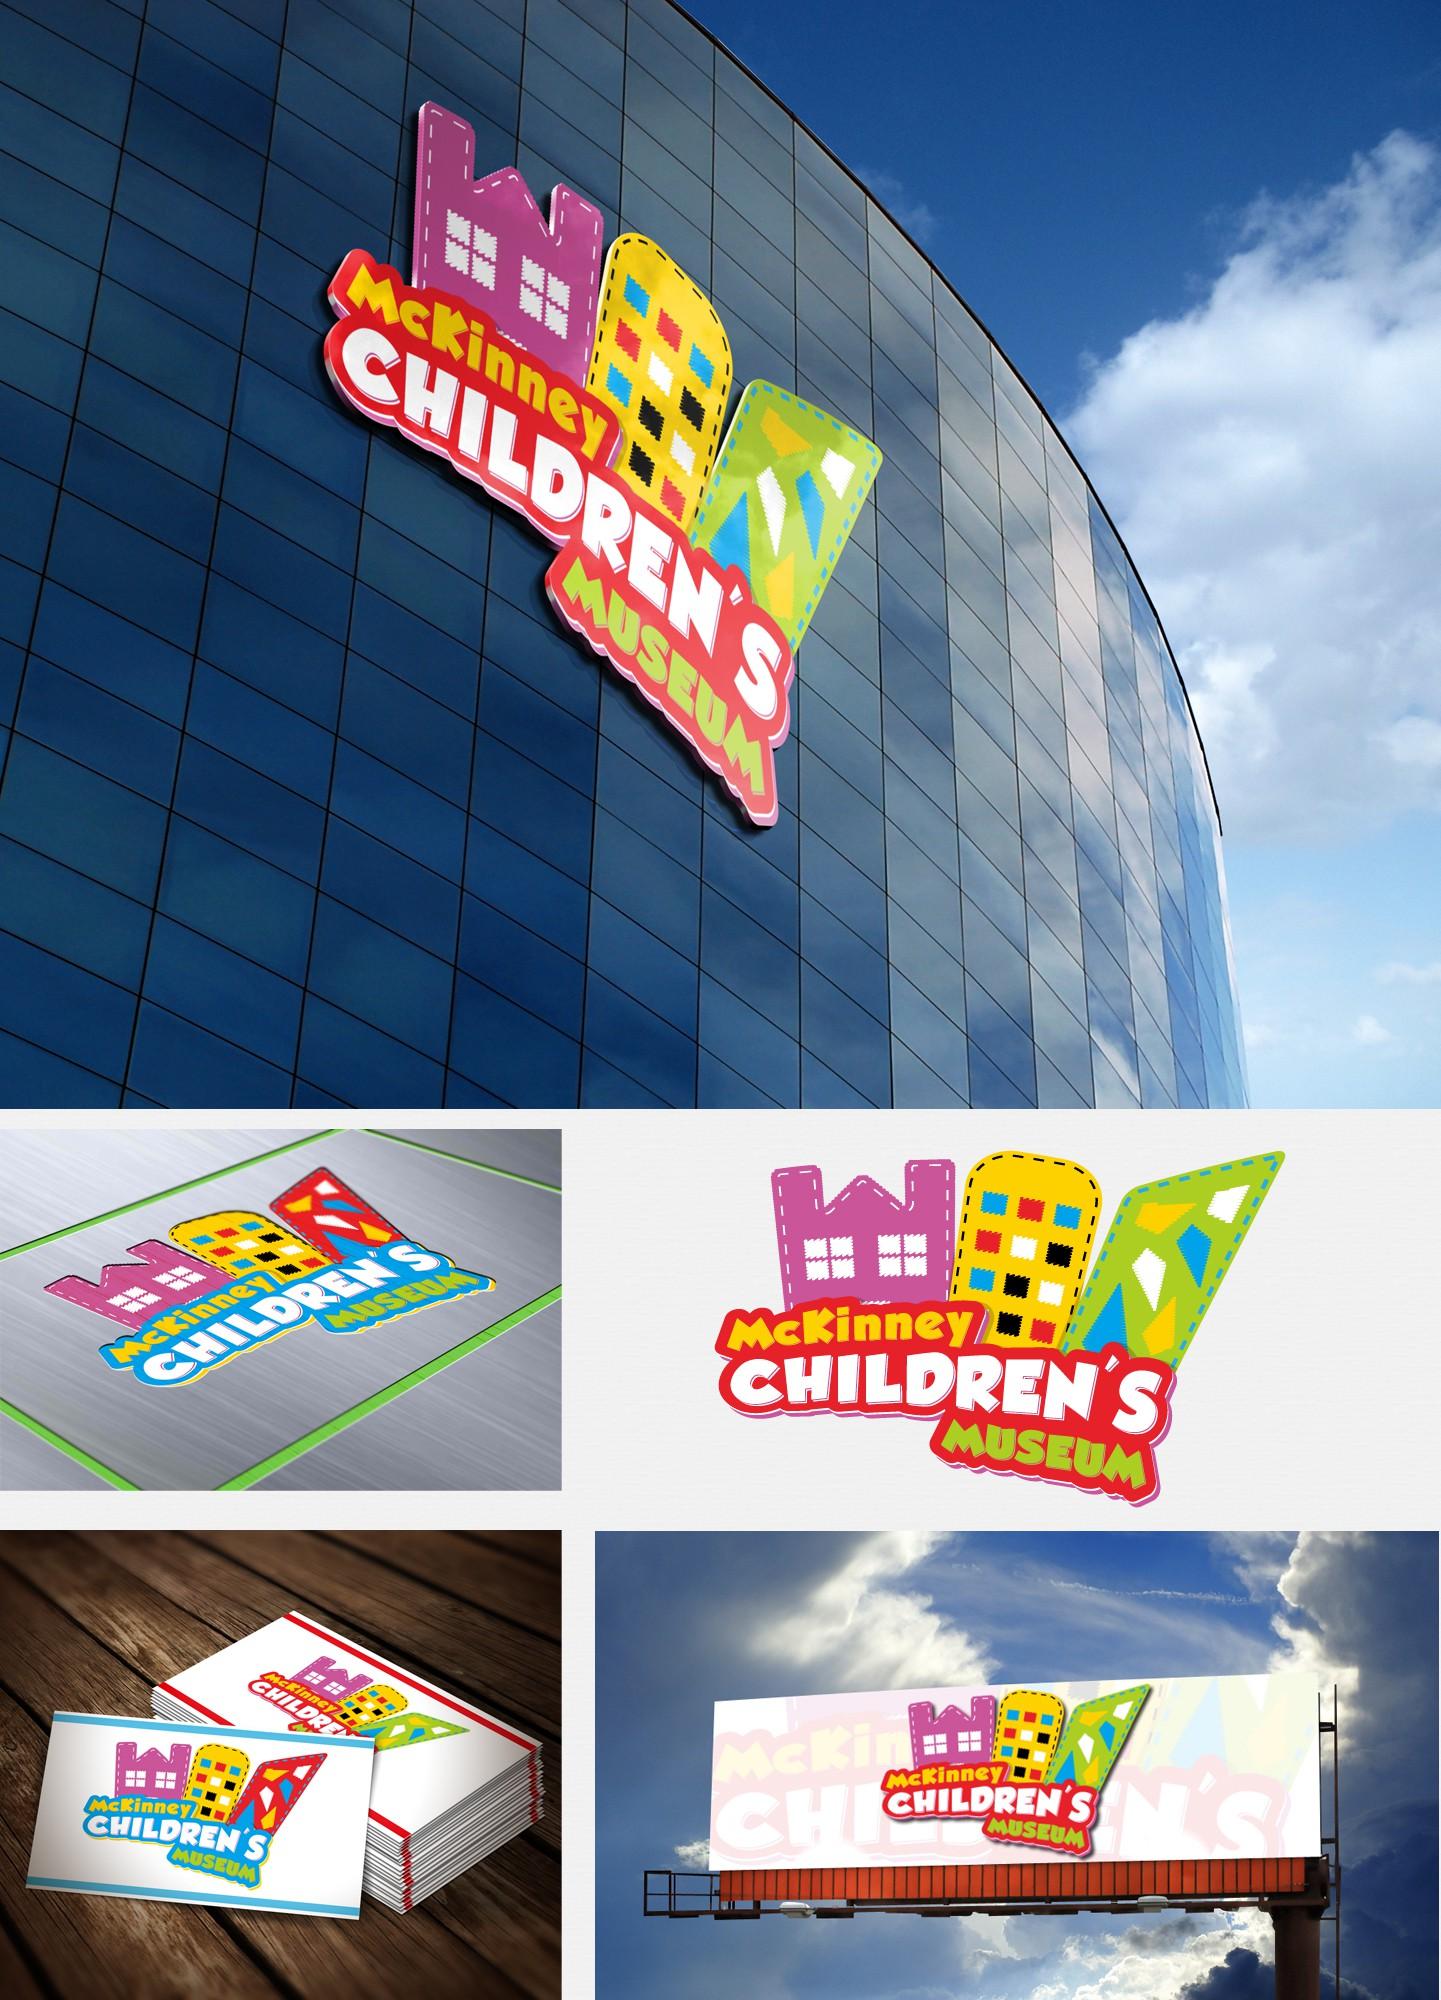 New logo wanted for McKinney Children's Museum